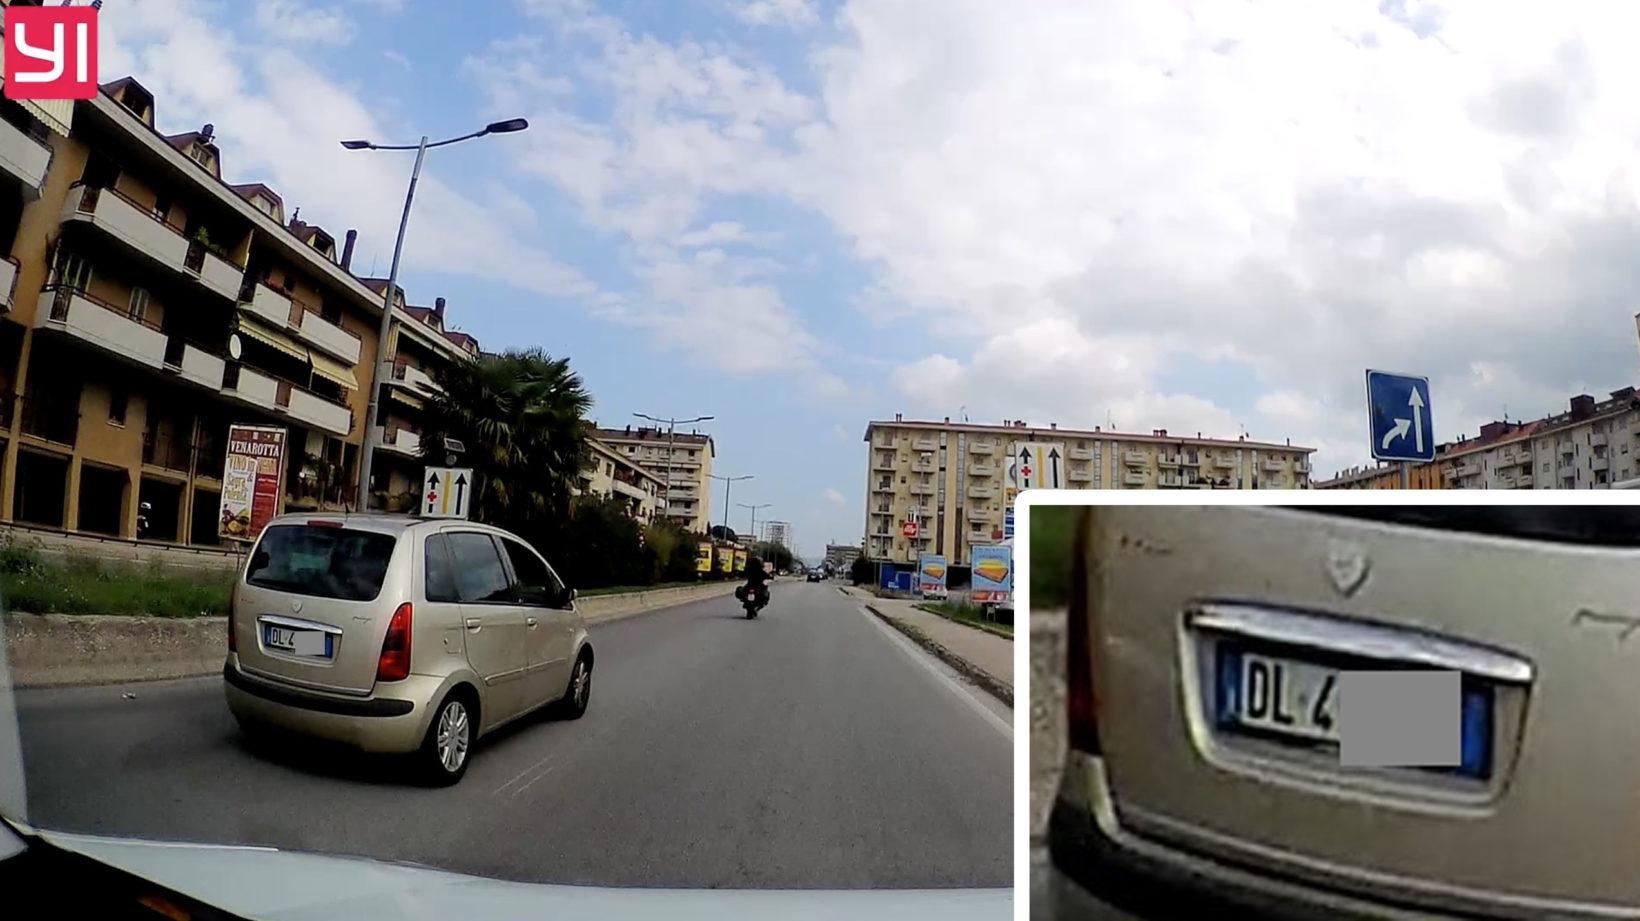 Yi Car Cam